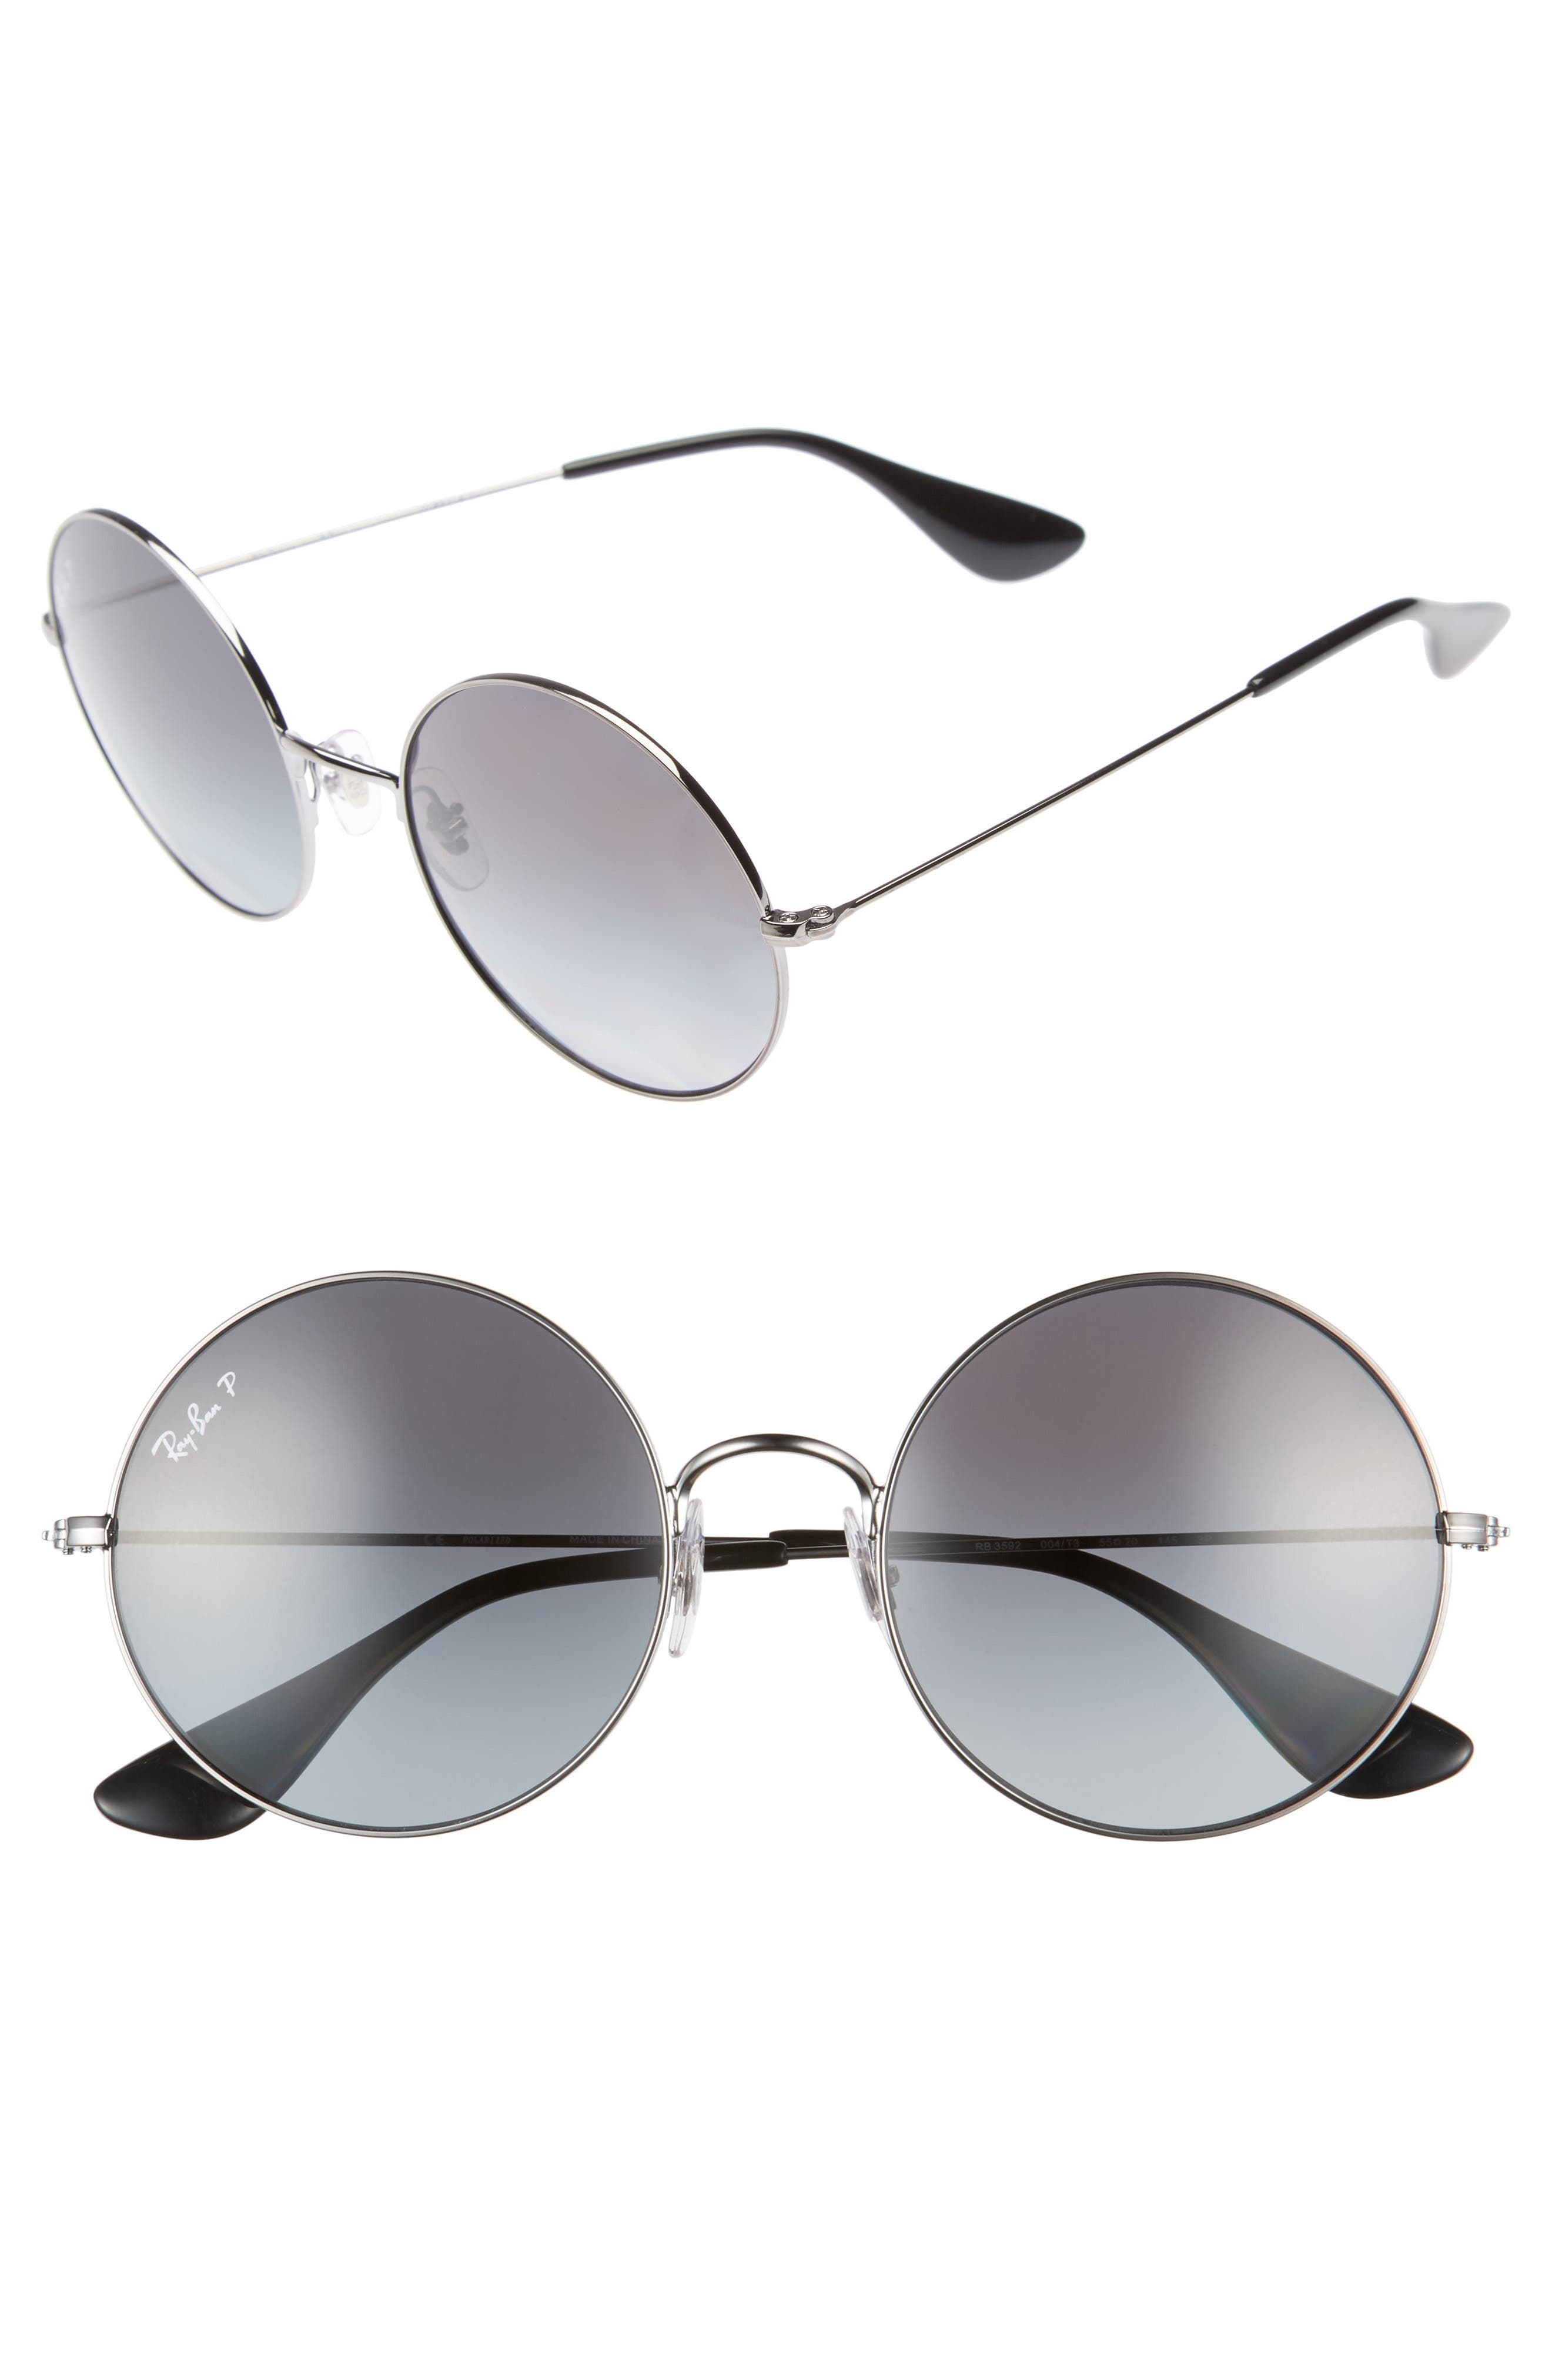 55mm Polarized Round Sunglasses,                         Main,                         color,